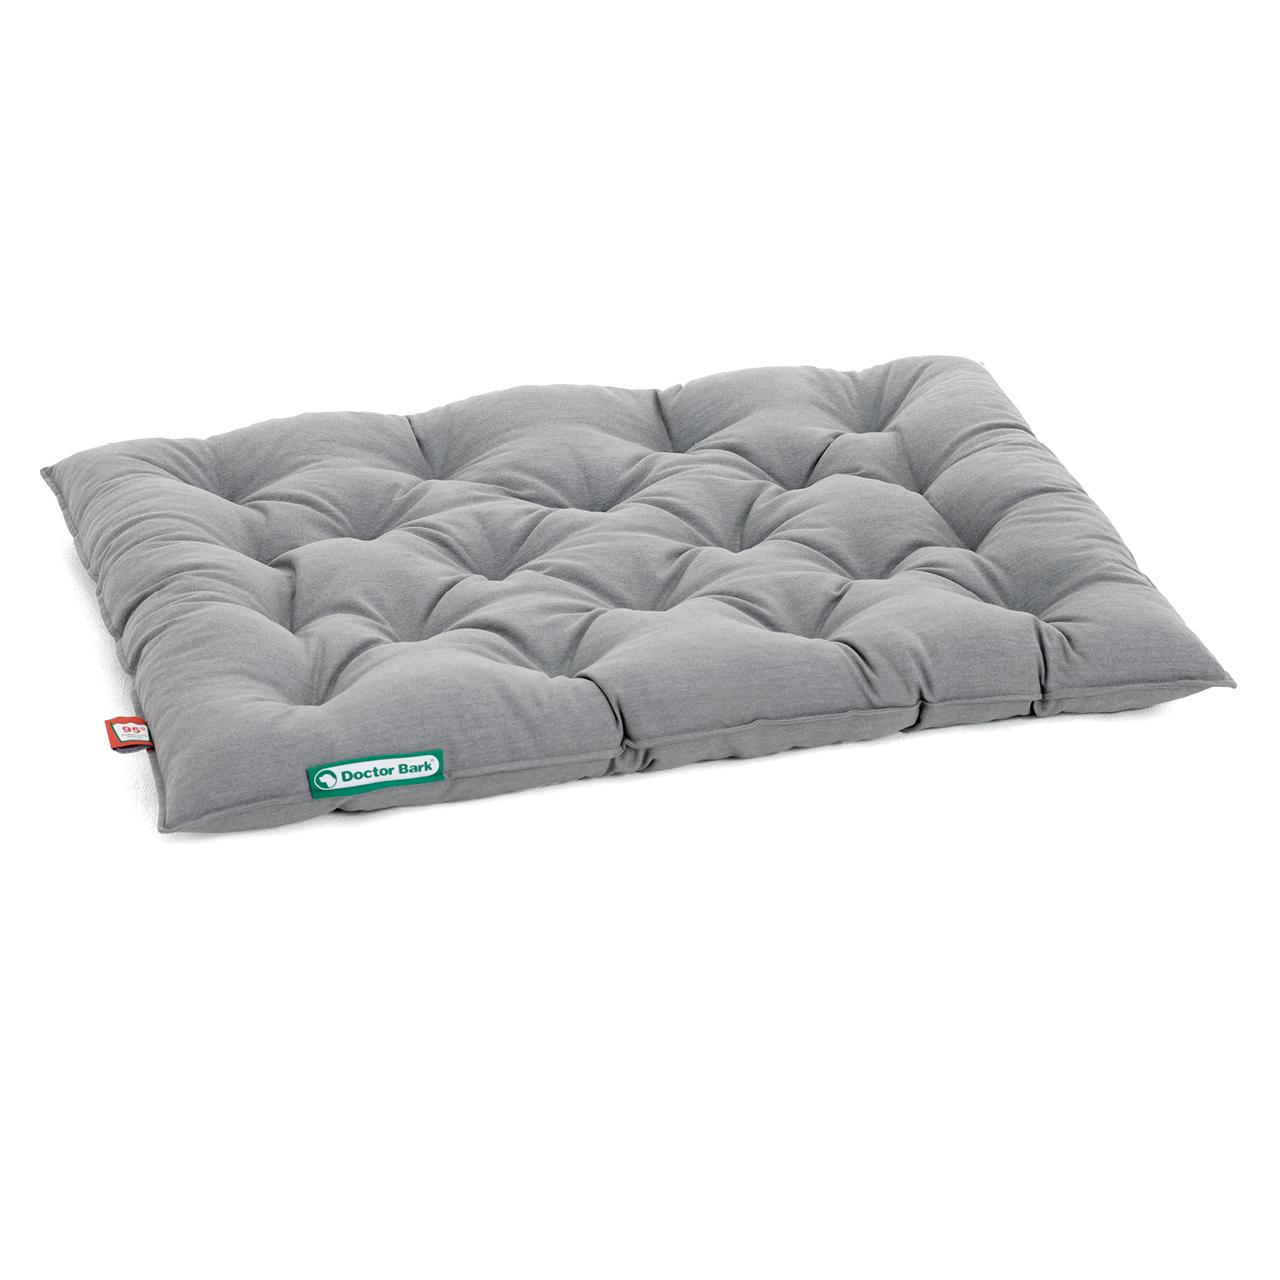 SET Bett + Einlegekissen ORTHOPÄDISCH grau melange L